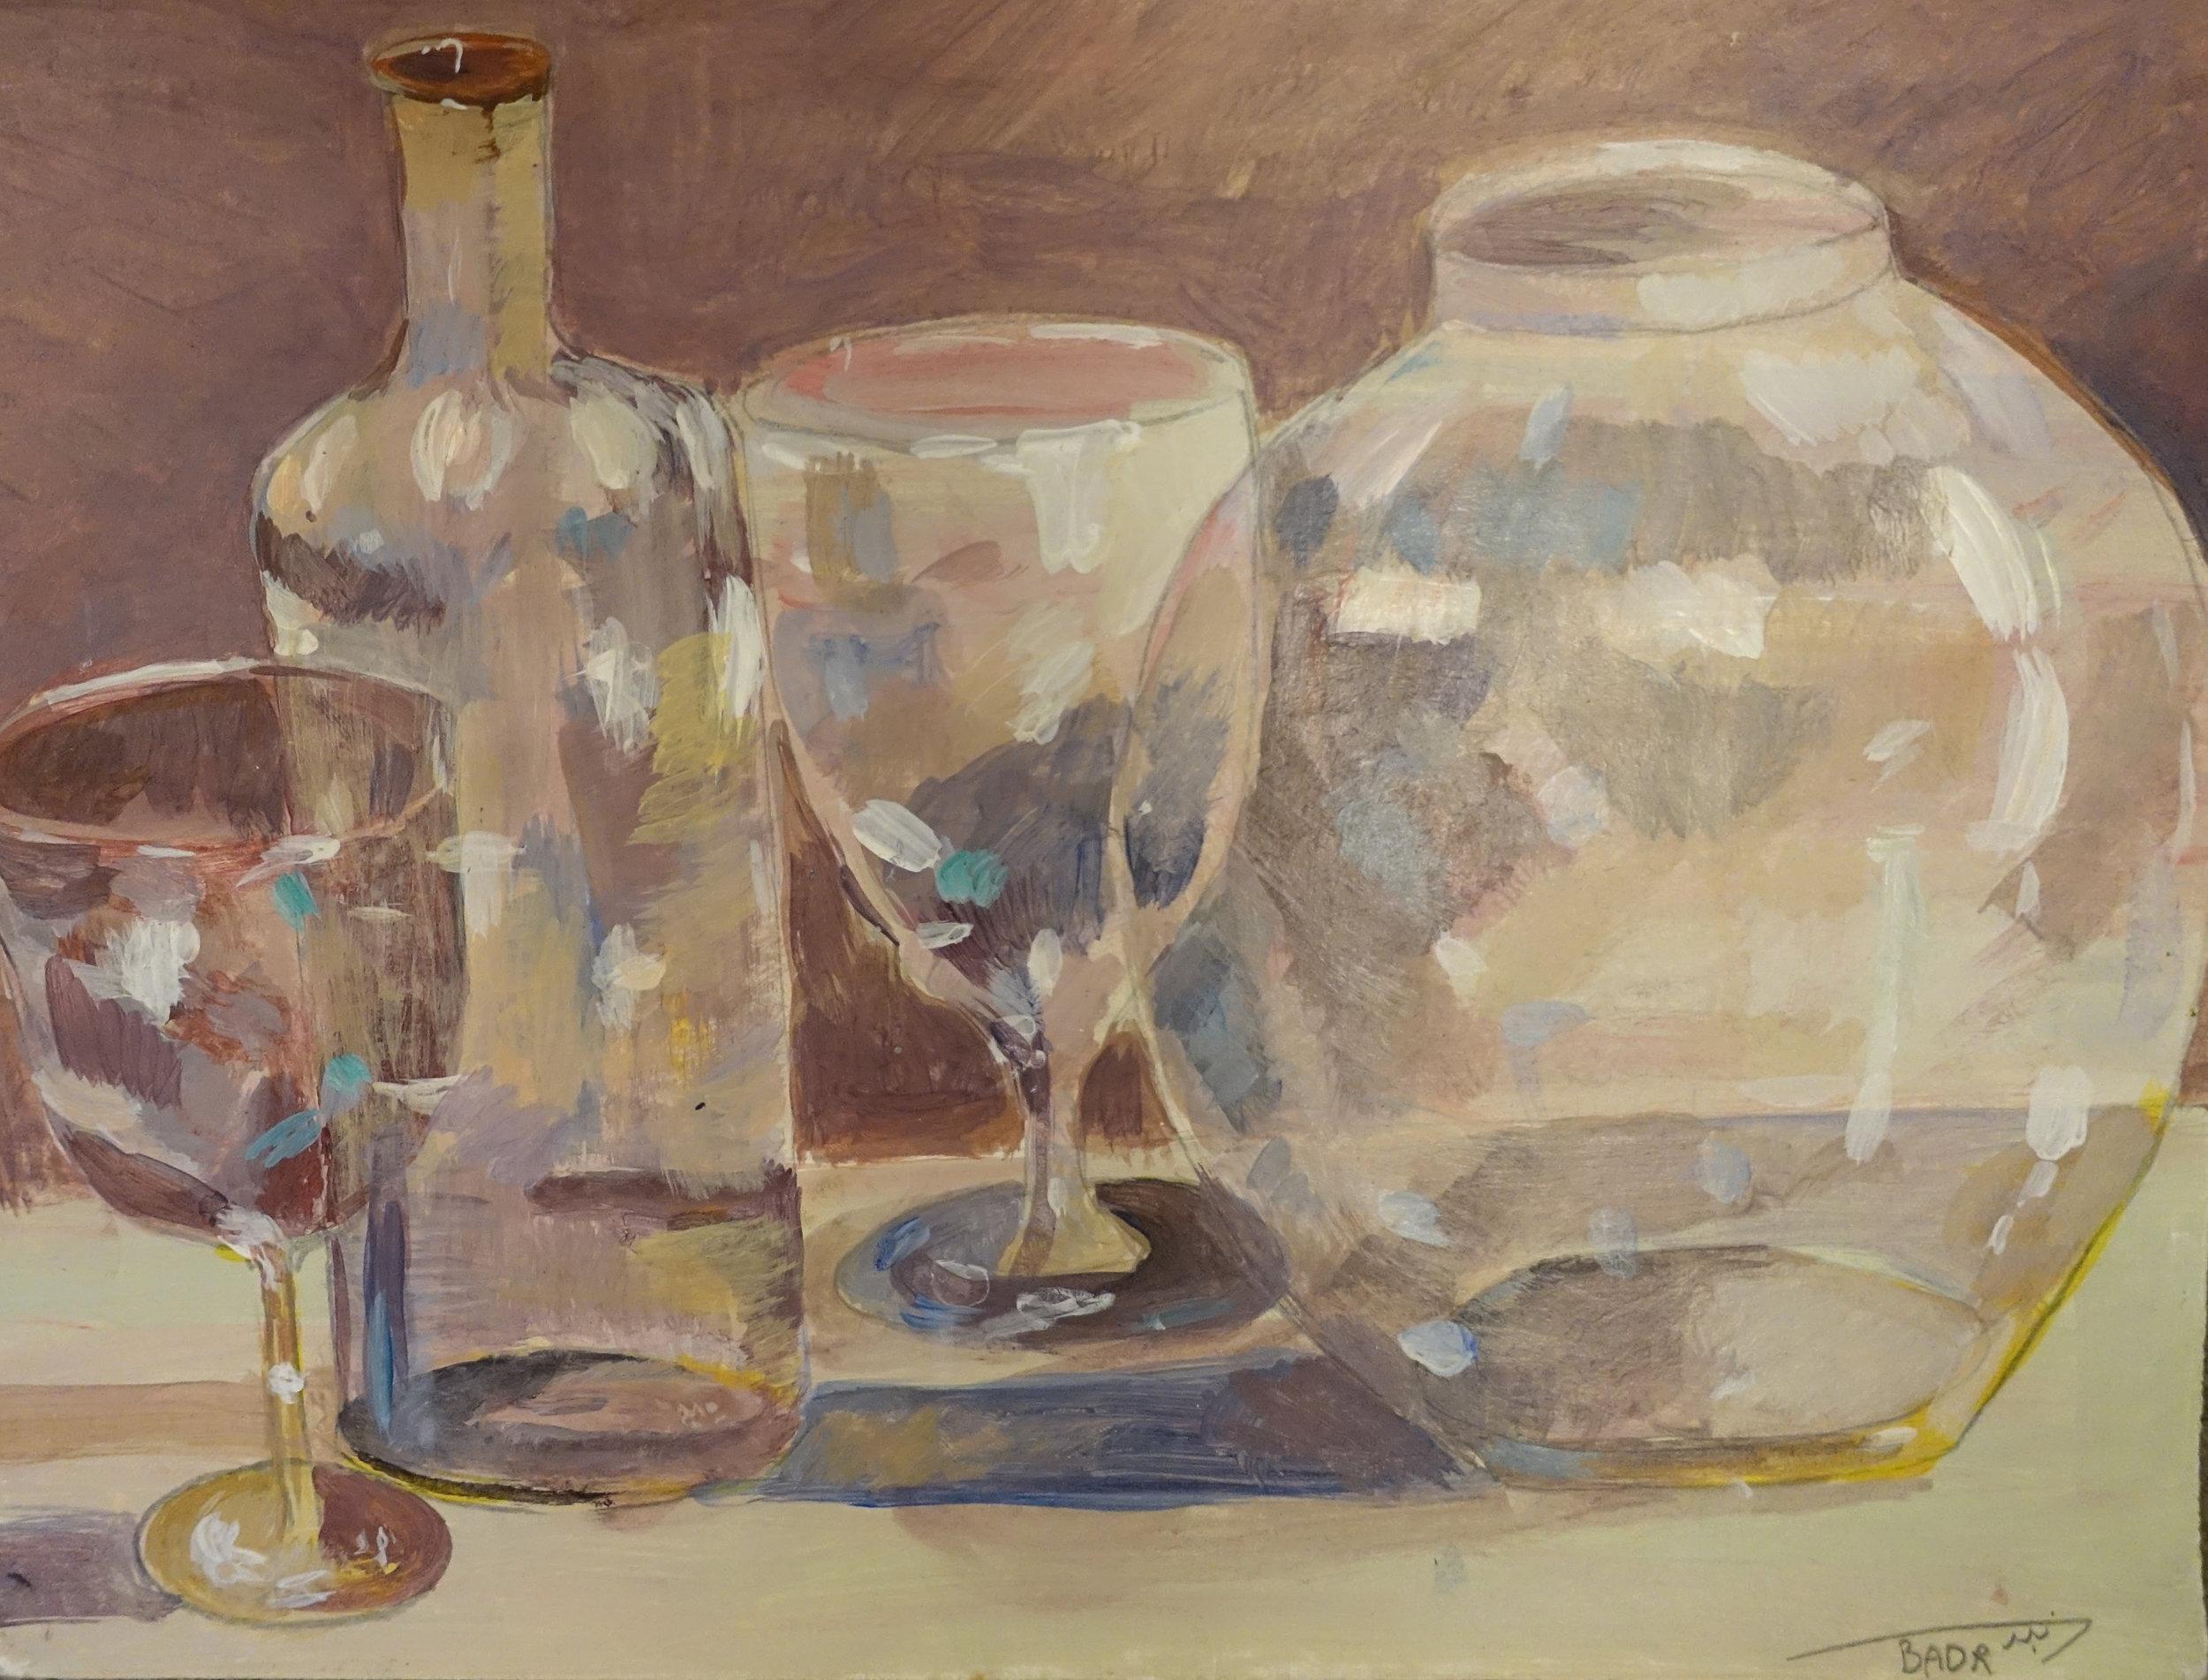 Ahmed Rabbani, Empty Glassware, 2015.